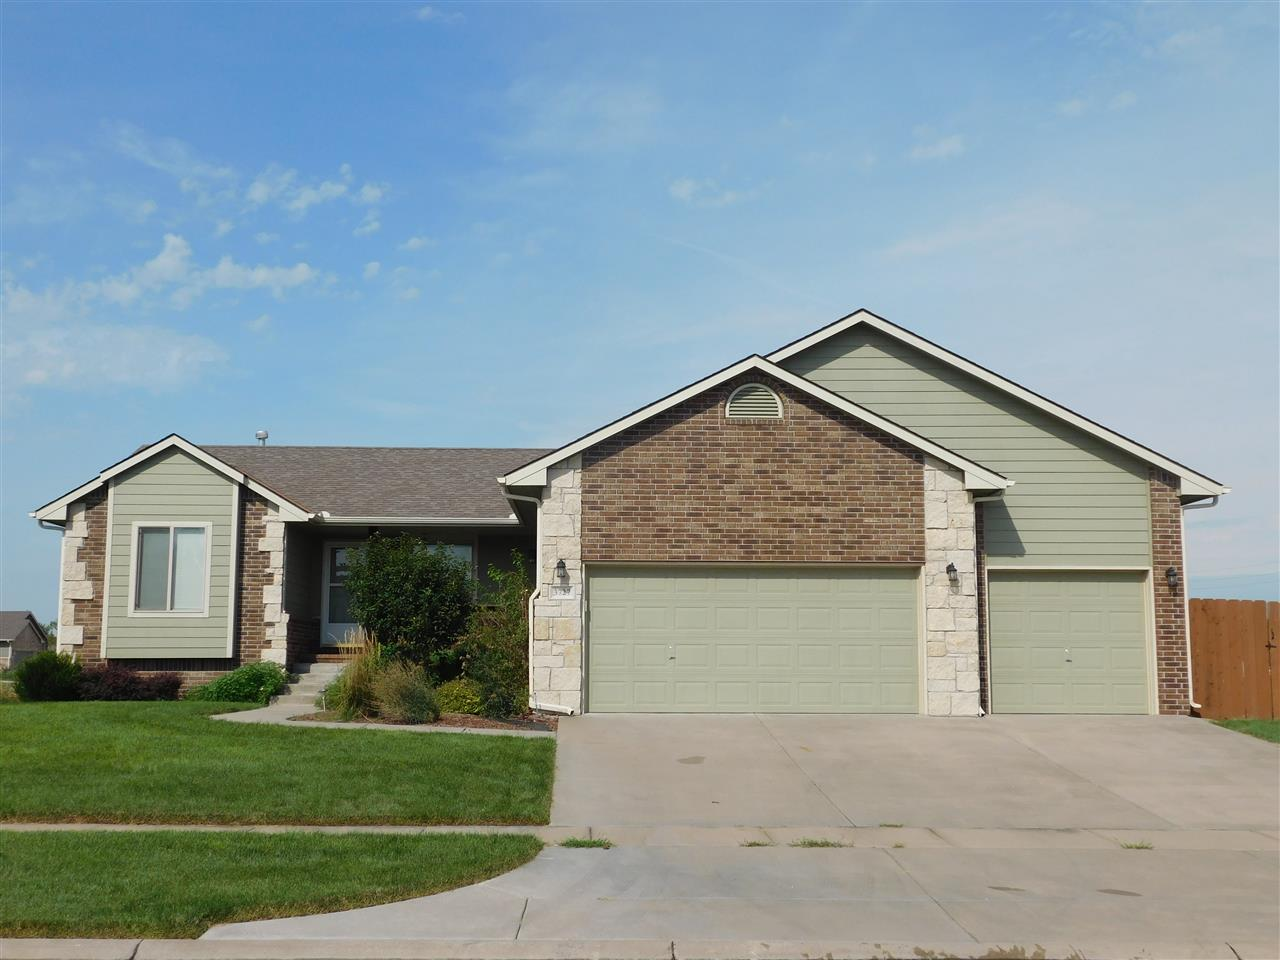 3727 N Pepper Rdg, Wichita, KS, 67205